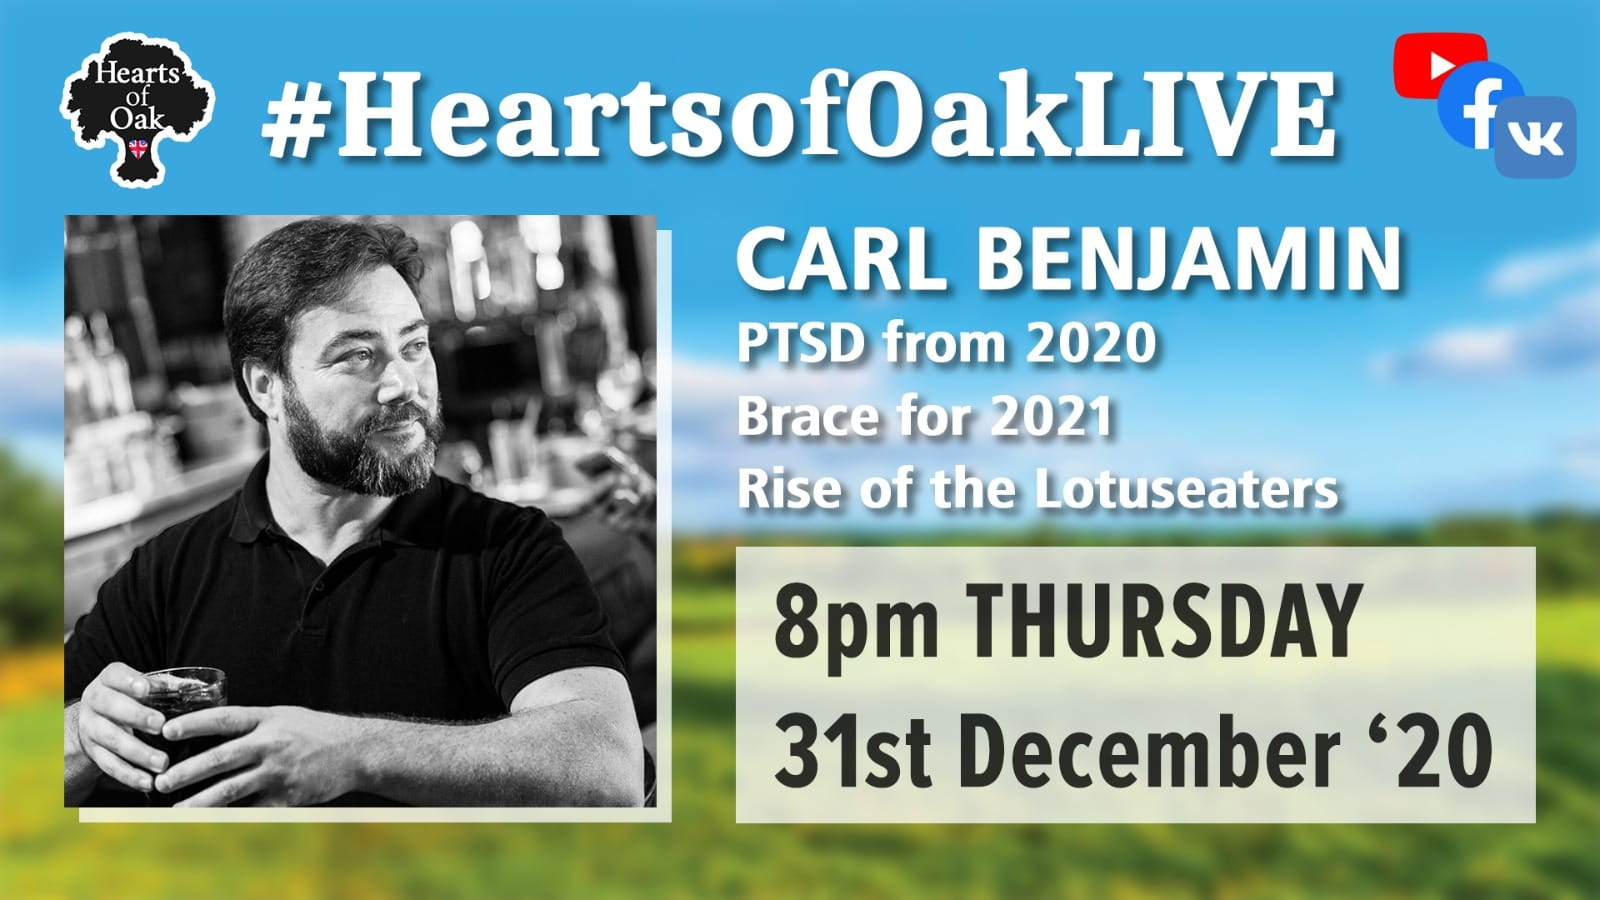 Carl Benjamin joins us to look forward to 2021